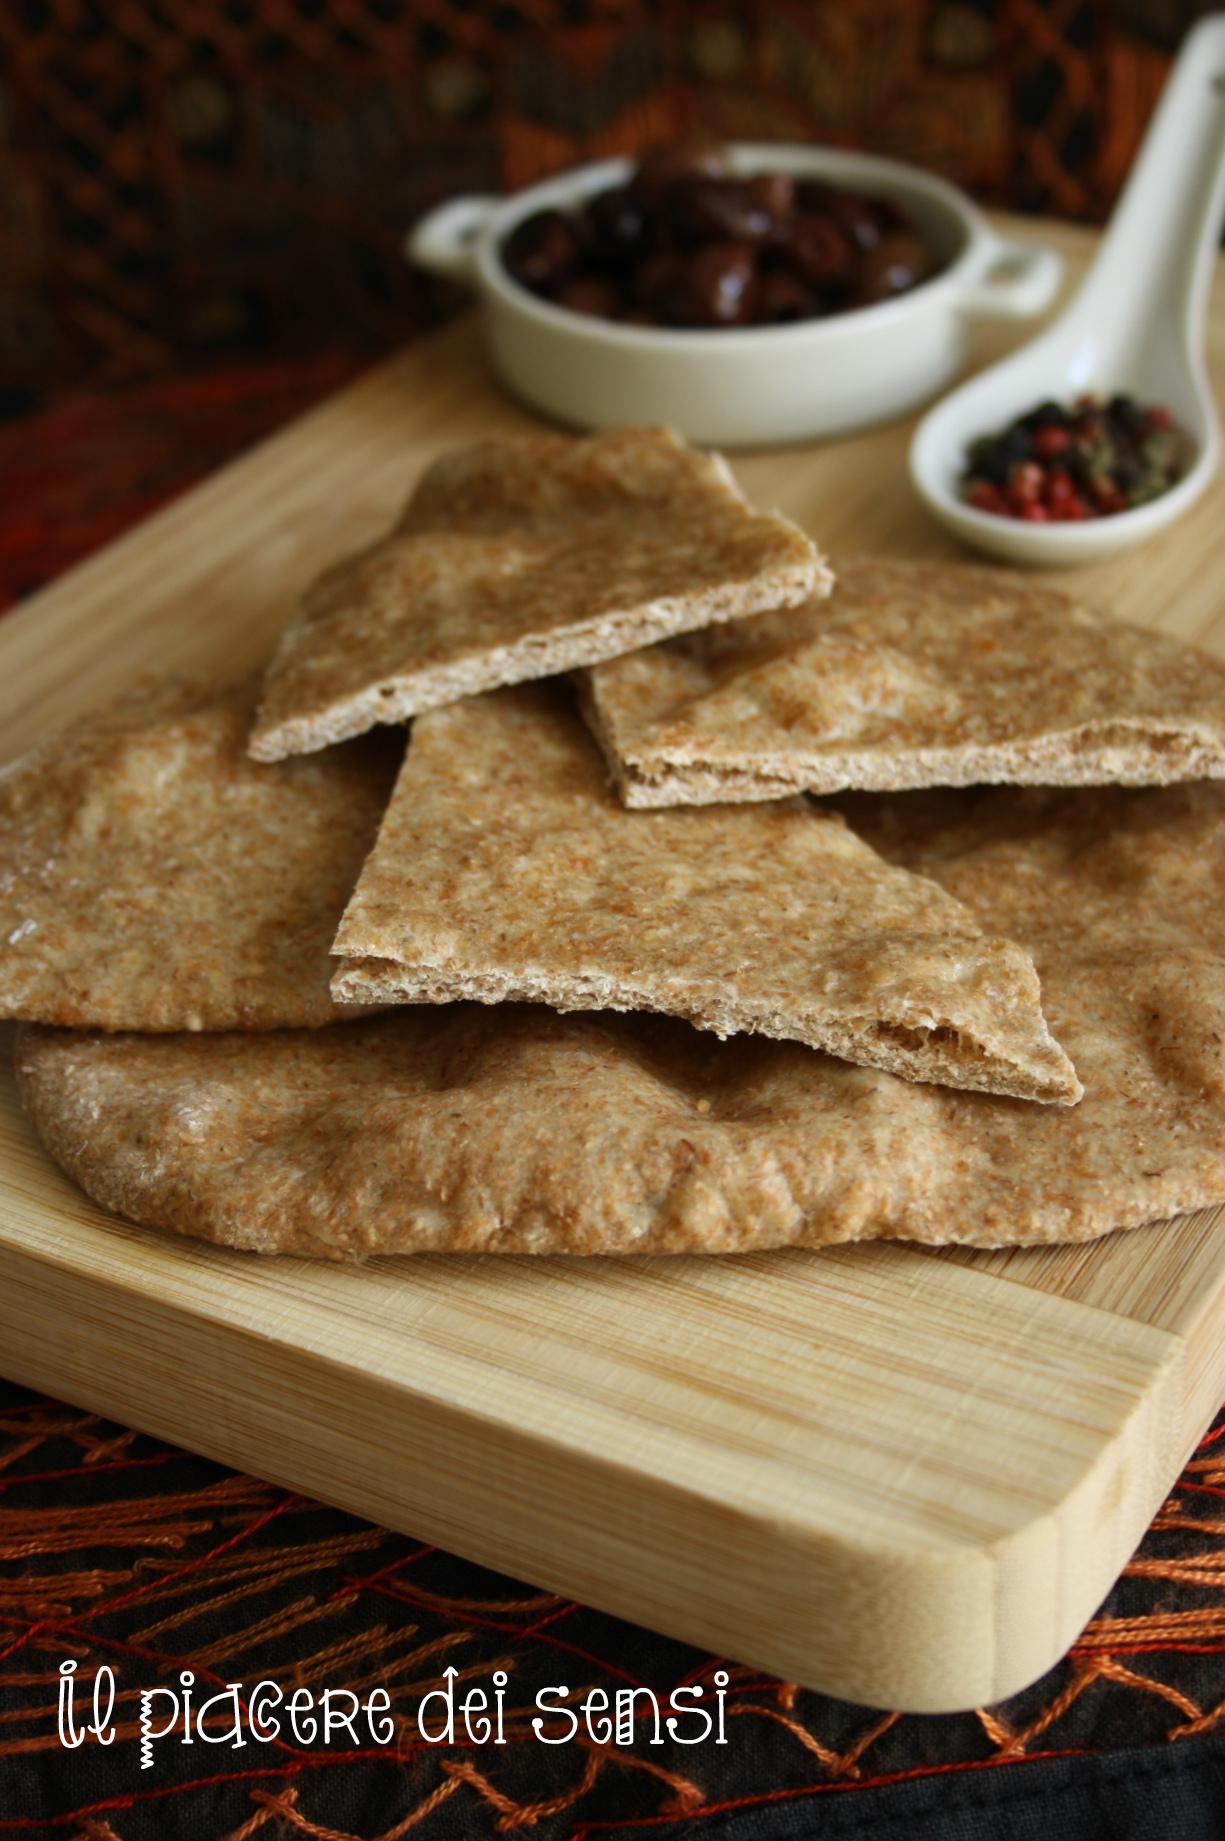 Tandoori roti - pane indiano integrale senza lievito